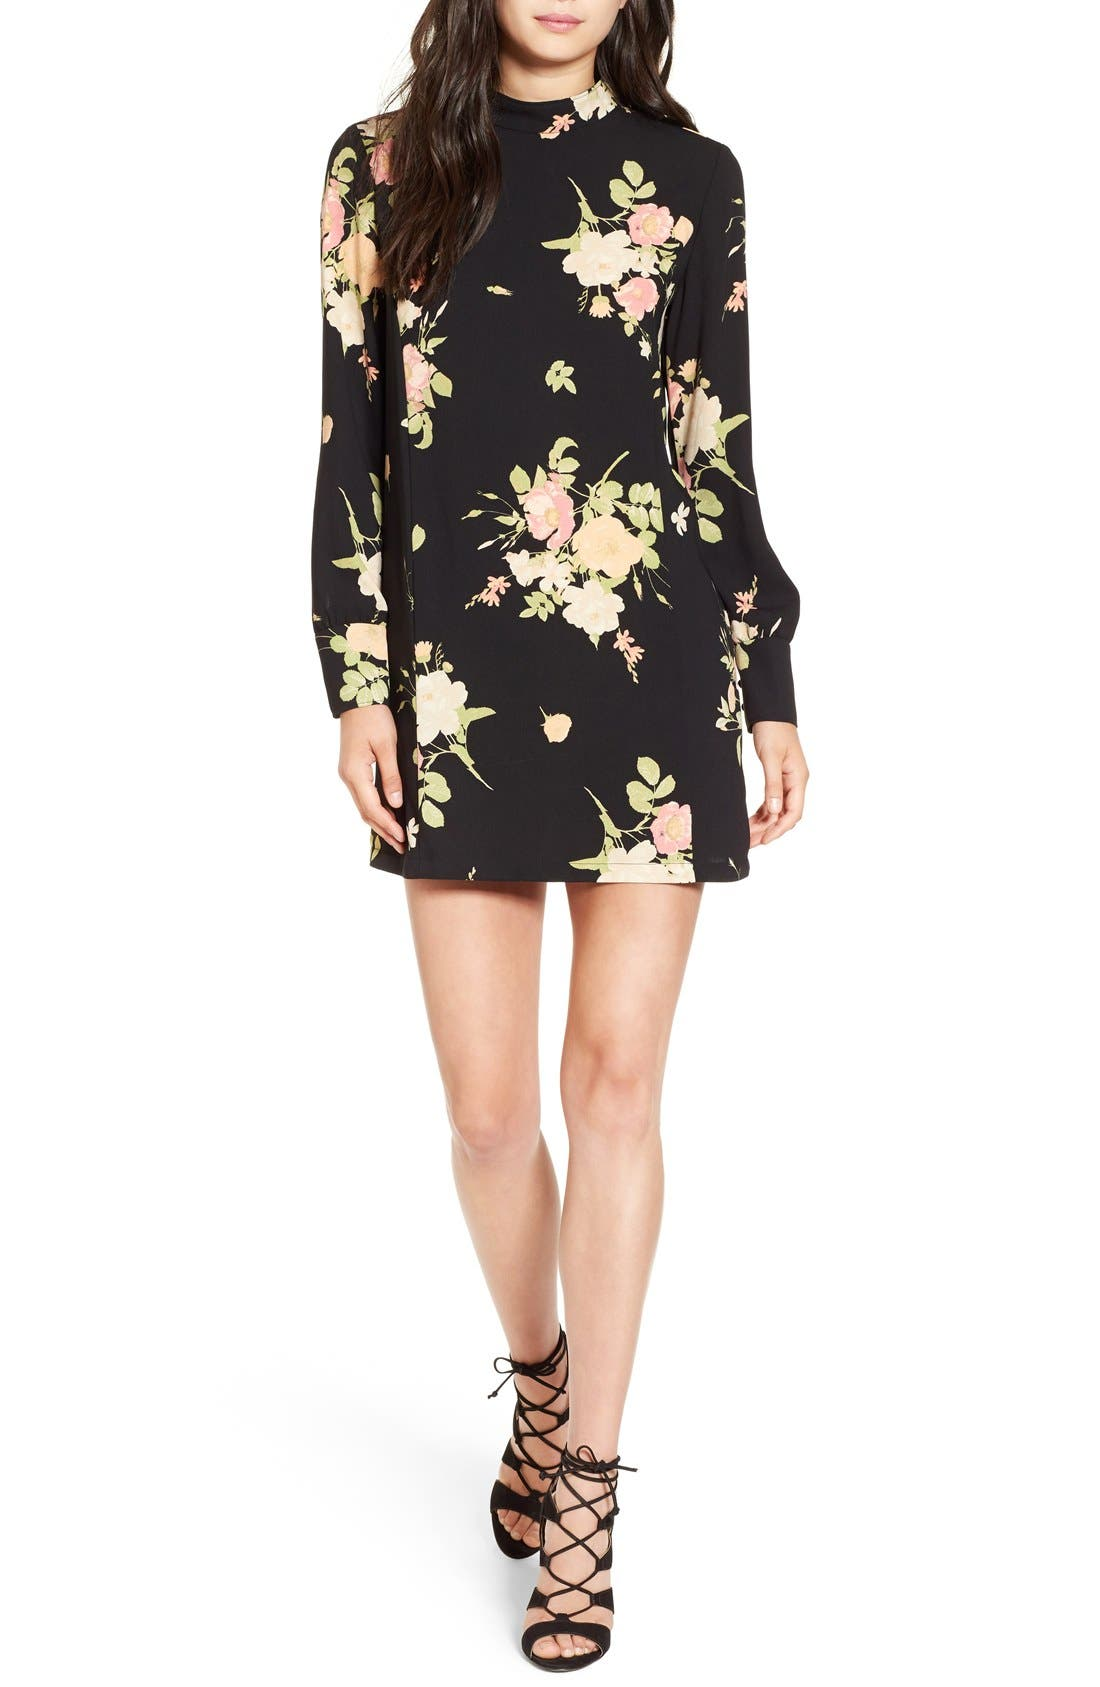 LEITH, Floral Print Mock Neck Shift Dress, Main thumbnail 1, color, 001